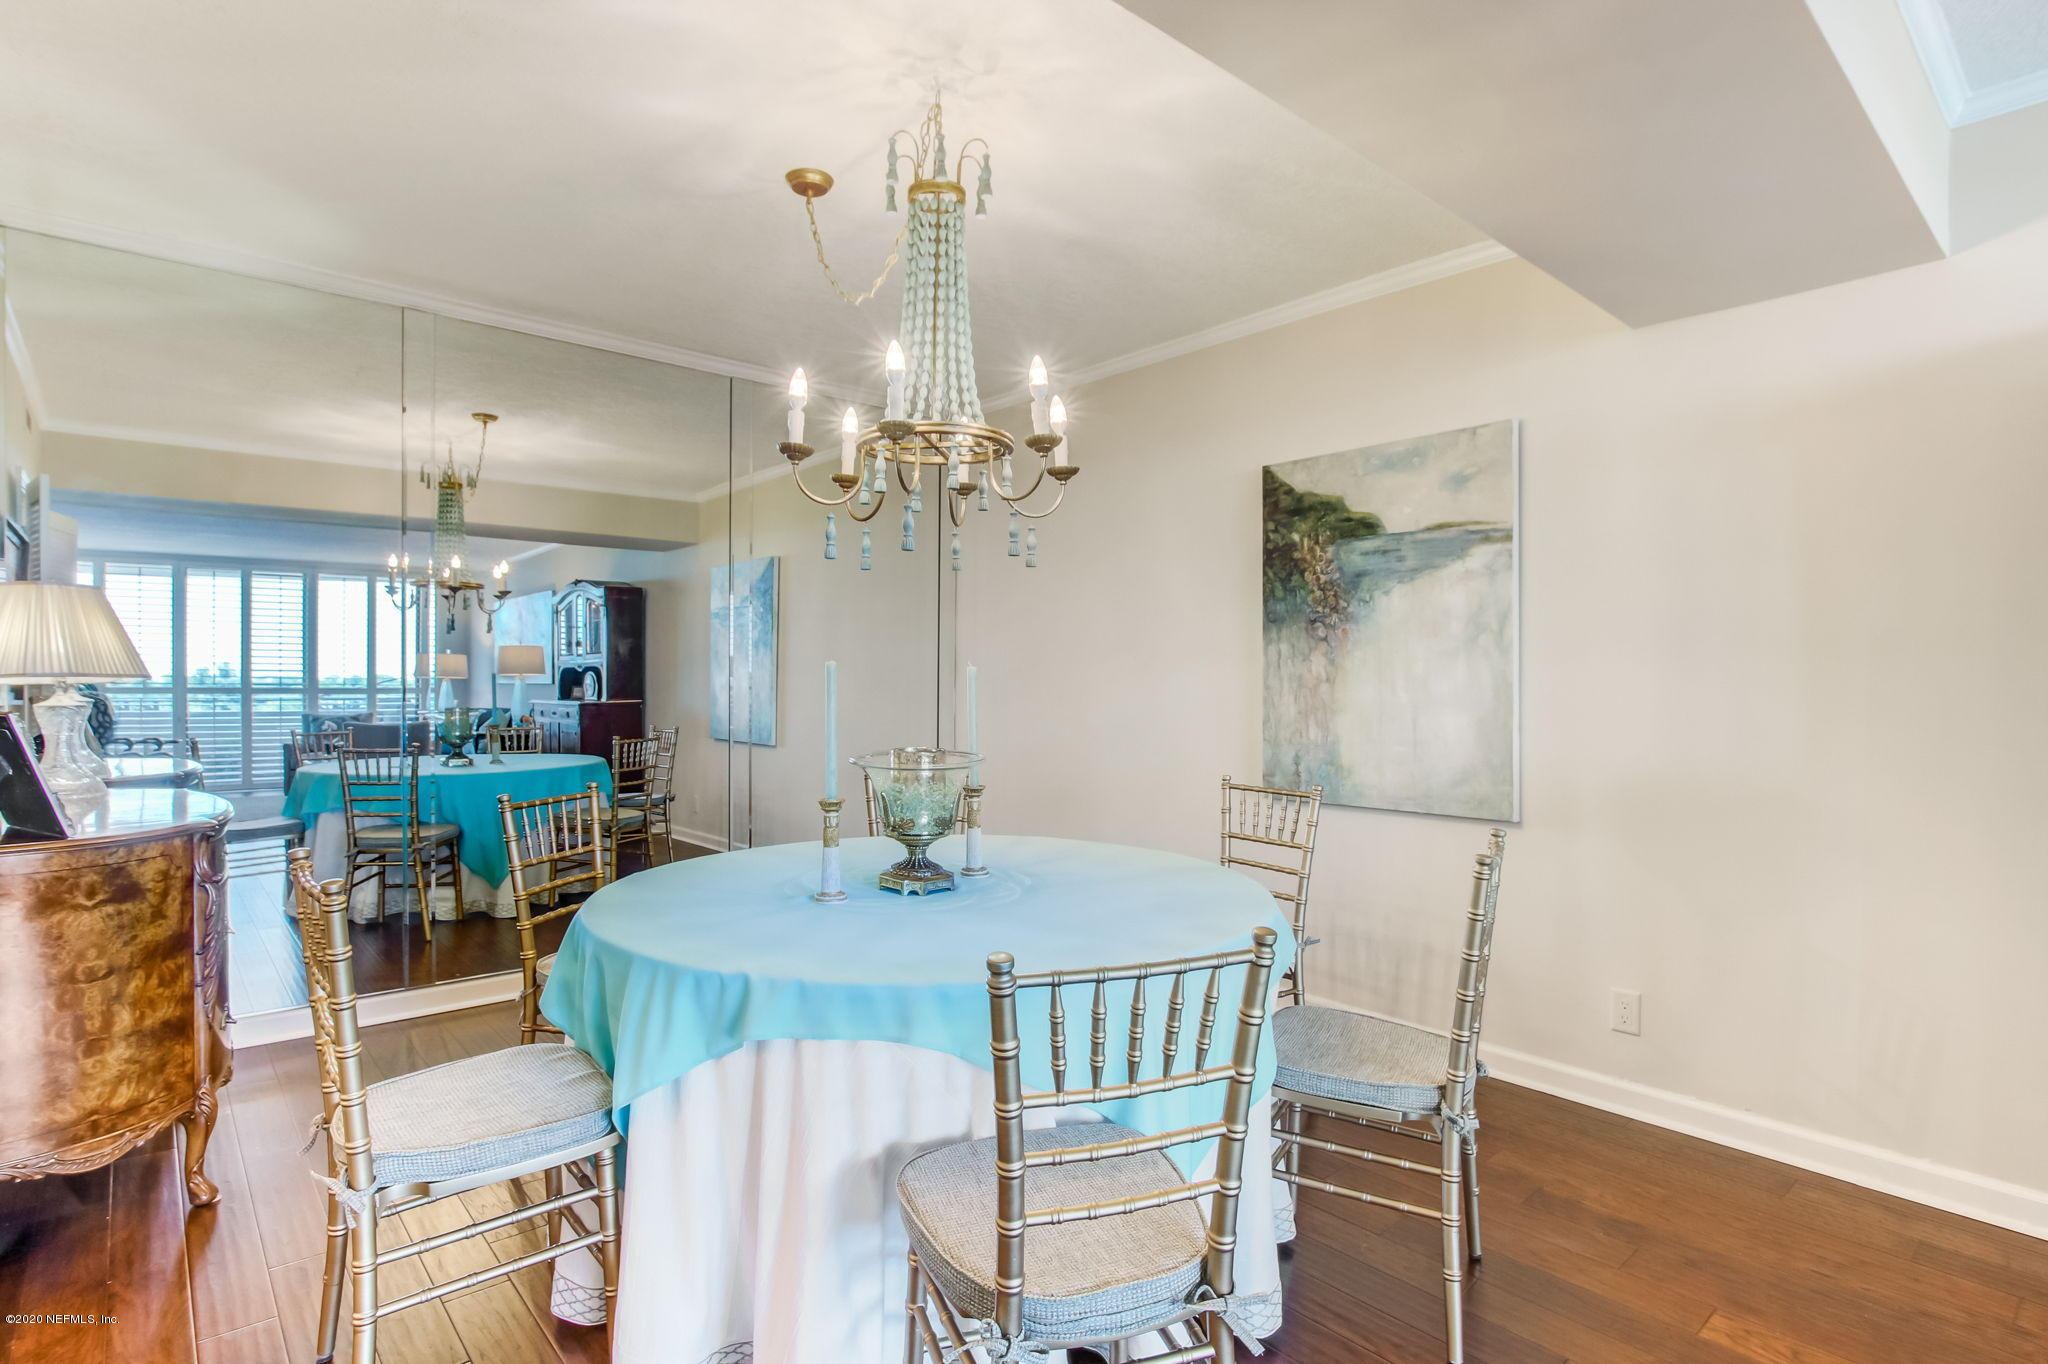 2970 ST JOHNS, JACKSONVILLE, FLORIDA 32205, 3 Bedrooms Bedrooms, ,2 BathroomsBathrooms,Residential,For sale,ST JOHNS,1052678